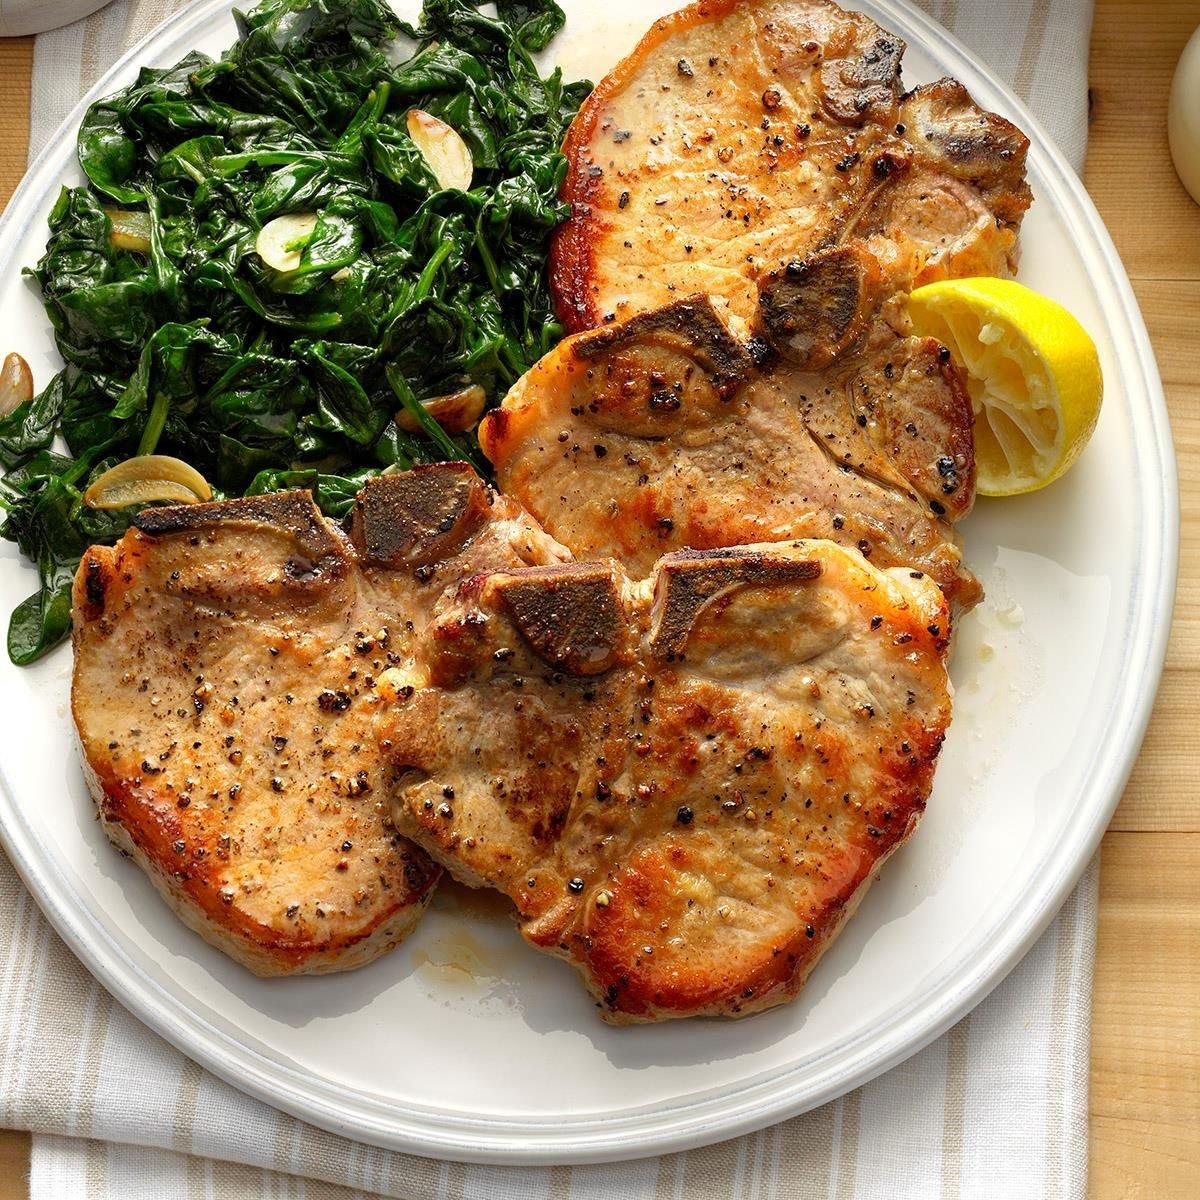 Sauteed Pork Chops With Garlic Spinach Exps Tham17 143734 B11 08 3b 6